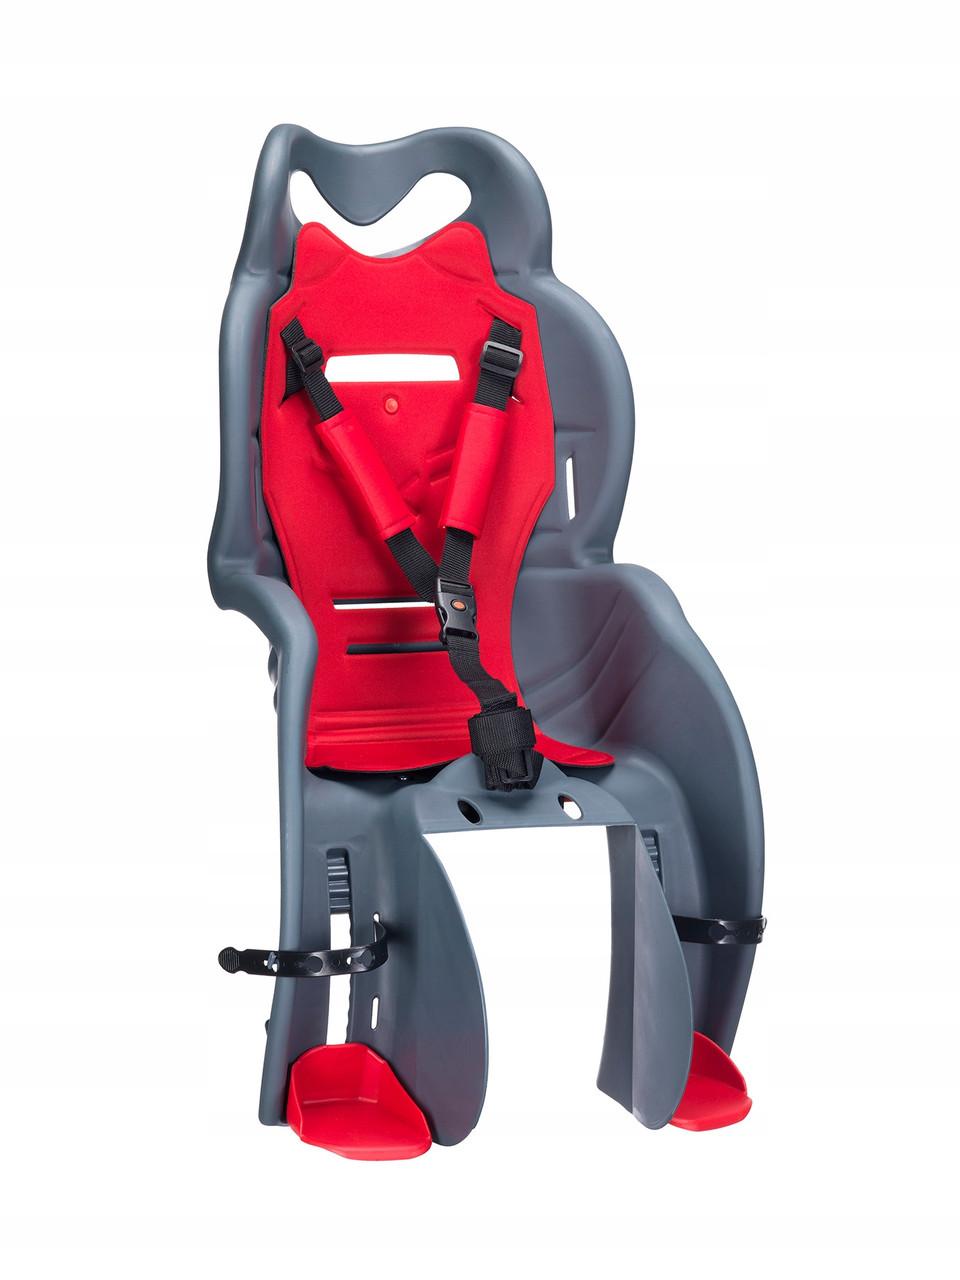 Велокрісло HTP SANBAS Італія на багажник Сіре